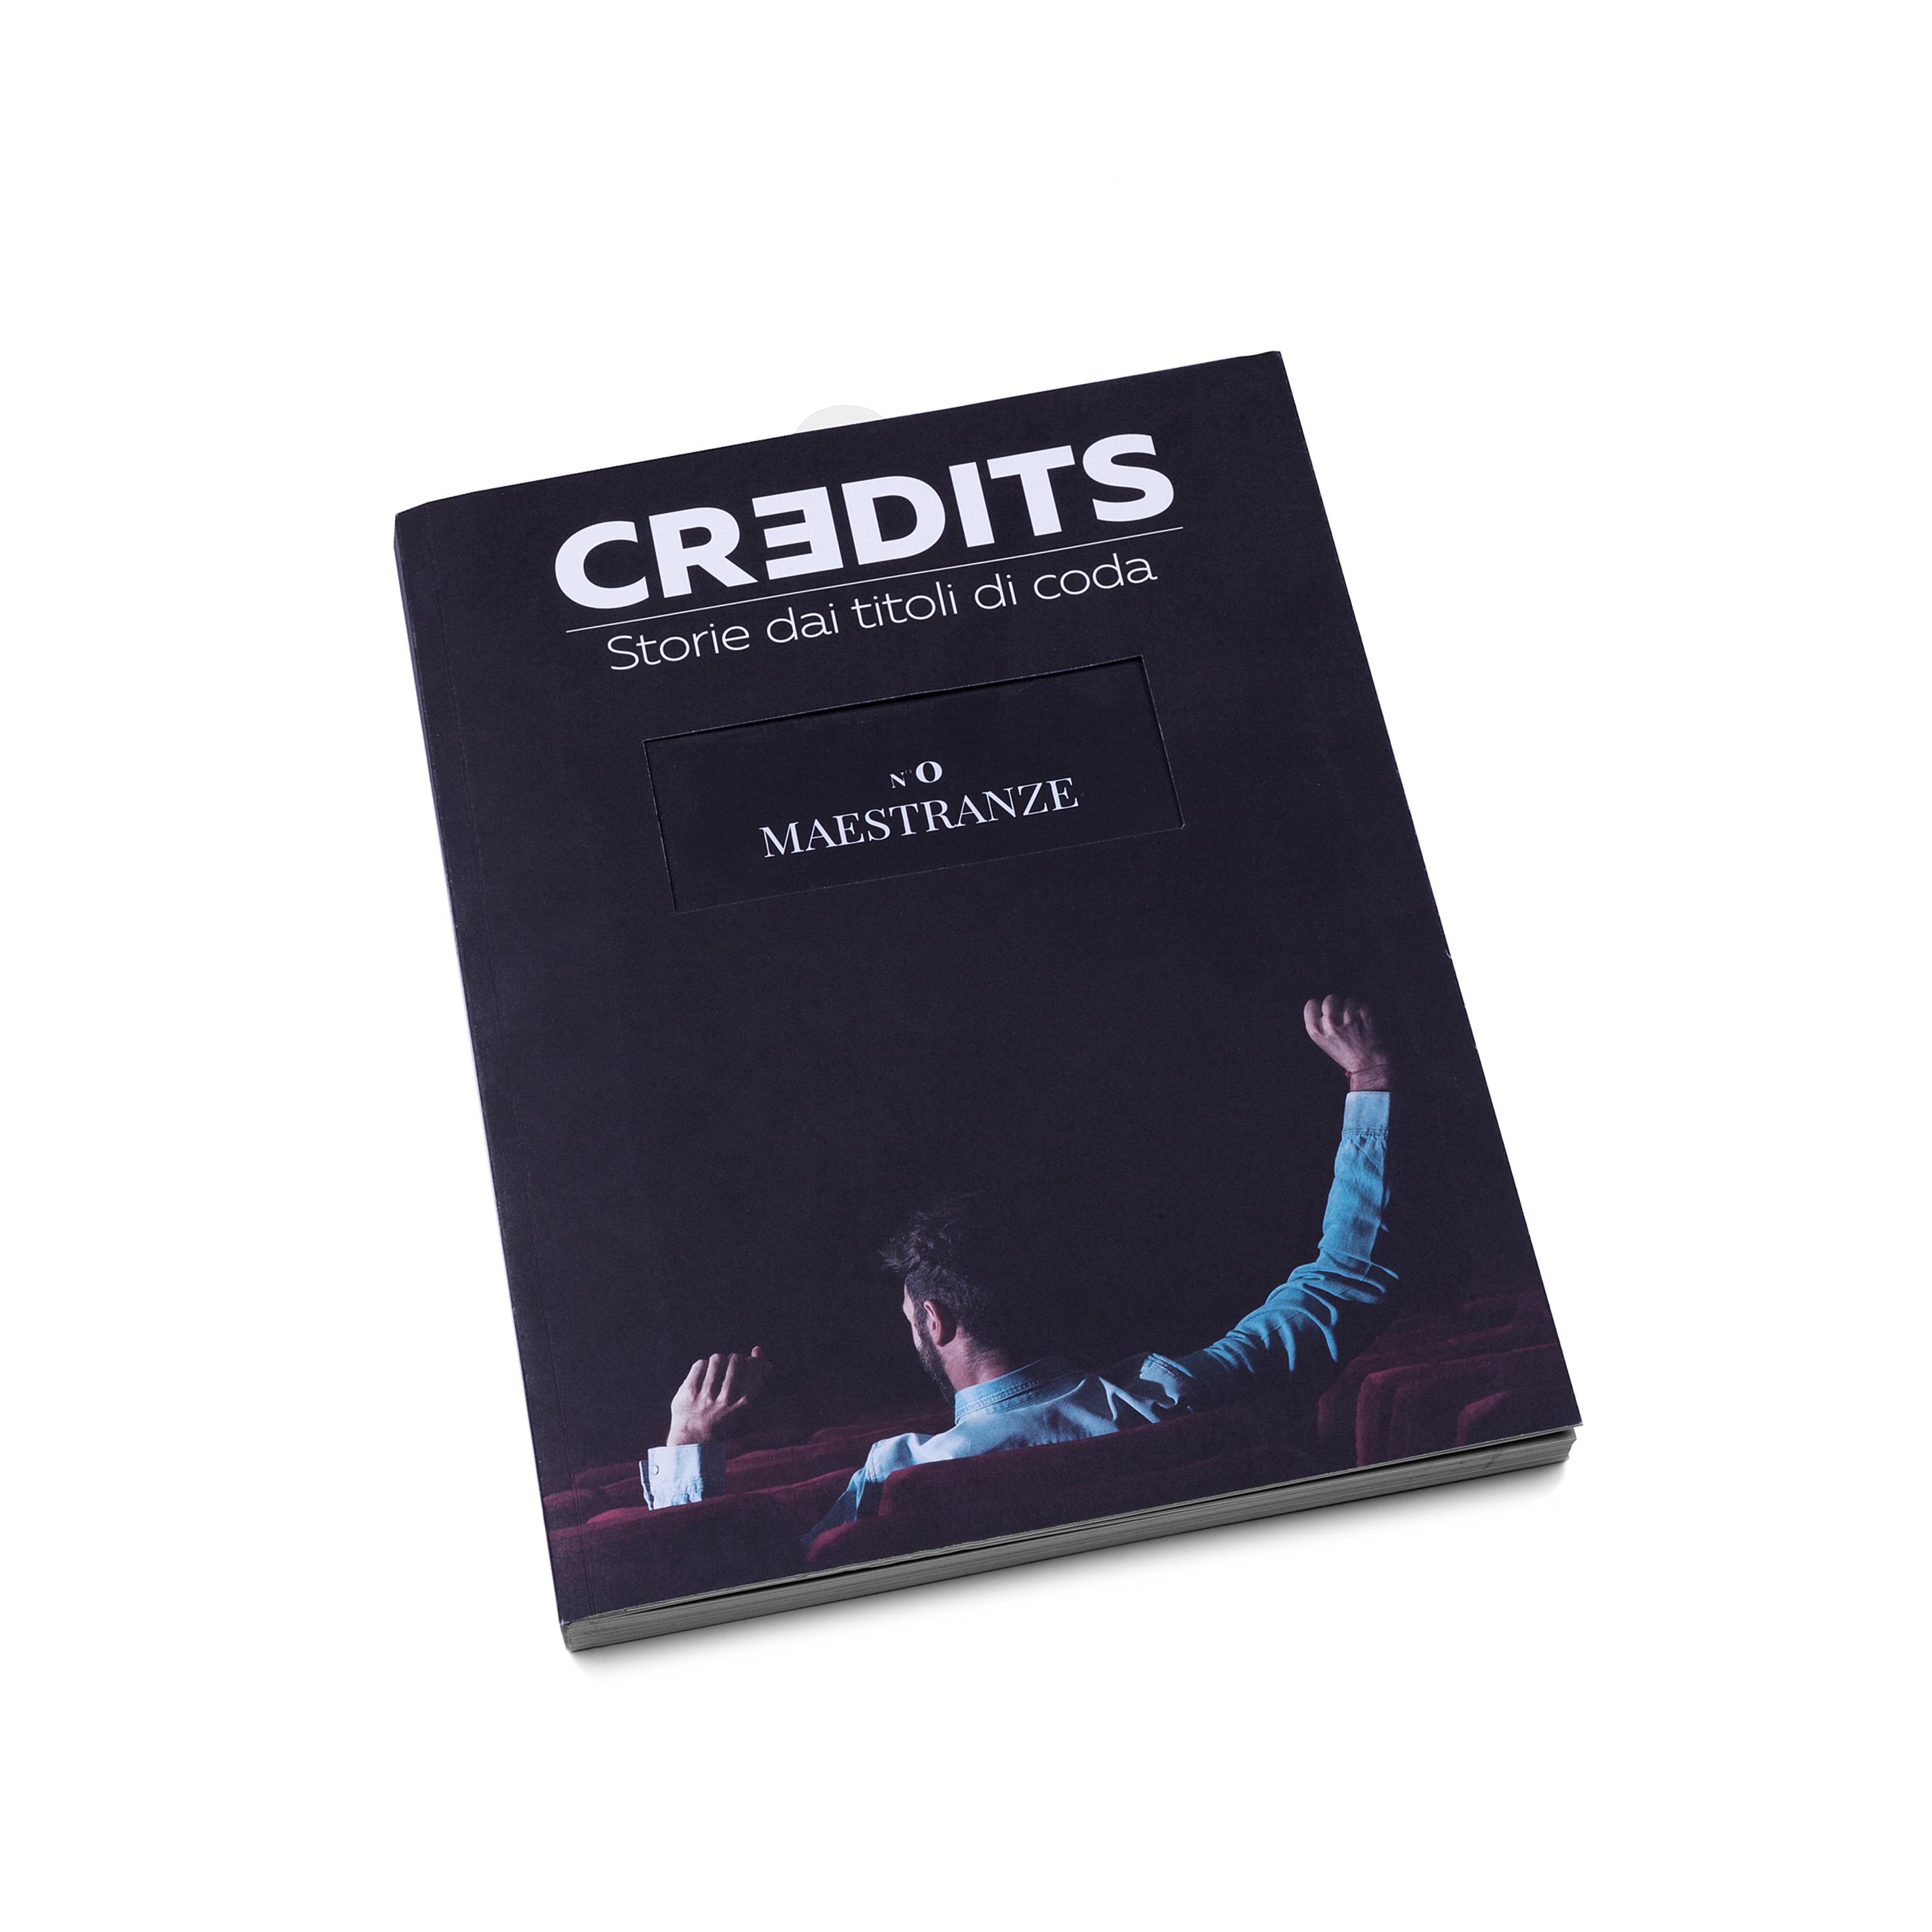 016_Credits 2015 (high)